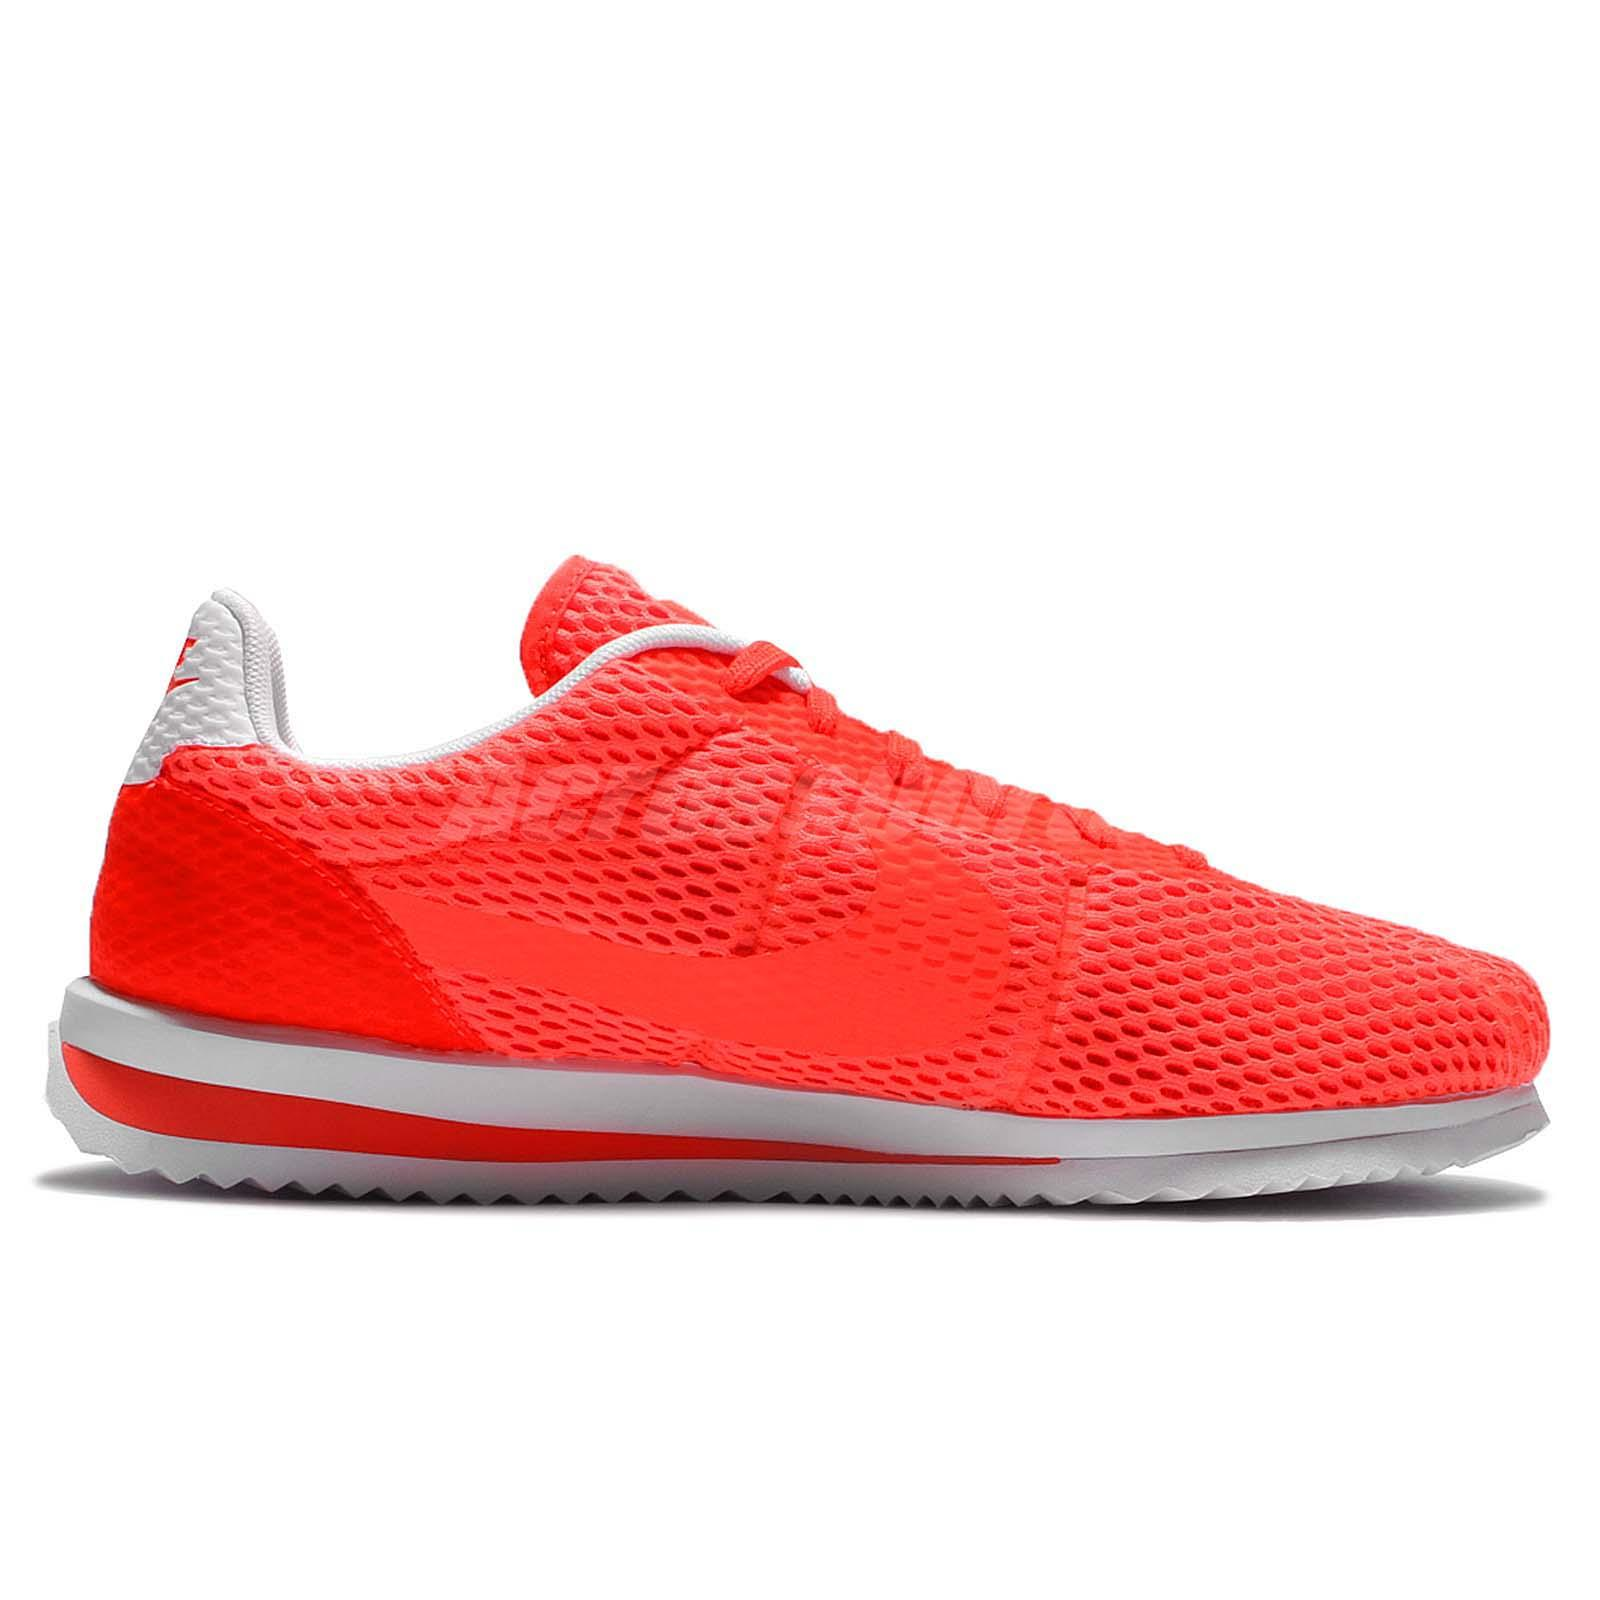 cb948b014e11 Nike Cortez Ultra BR Breathe Total Crimson Men Classic Shoes ...